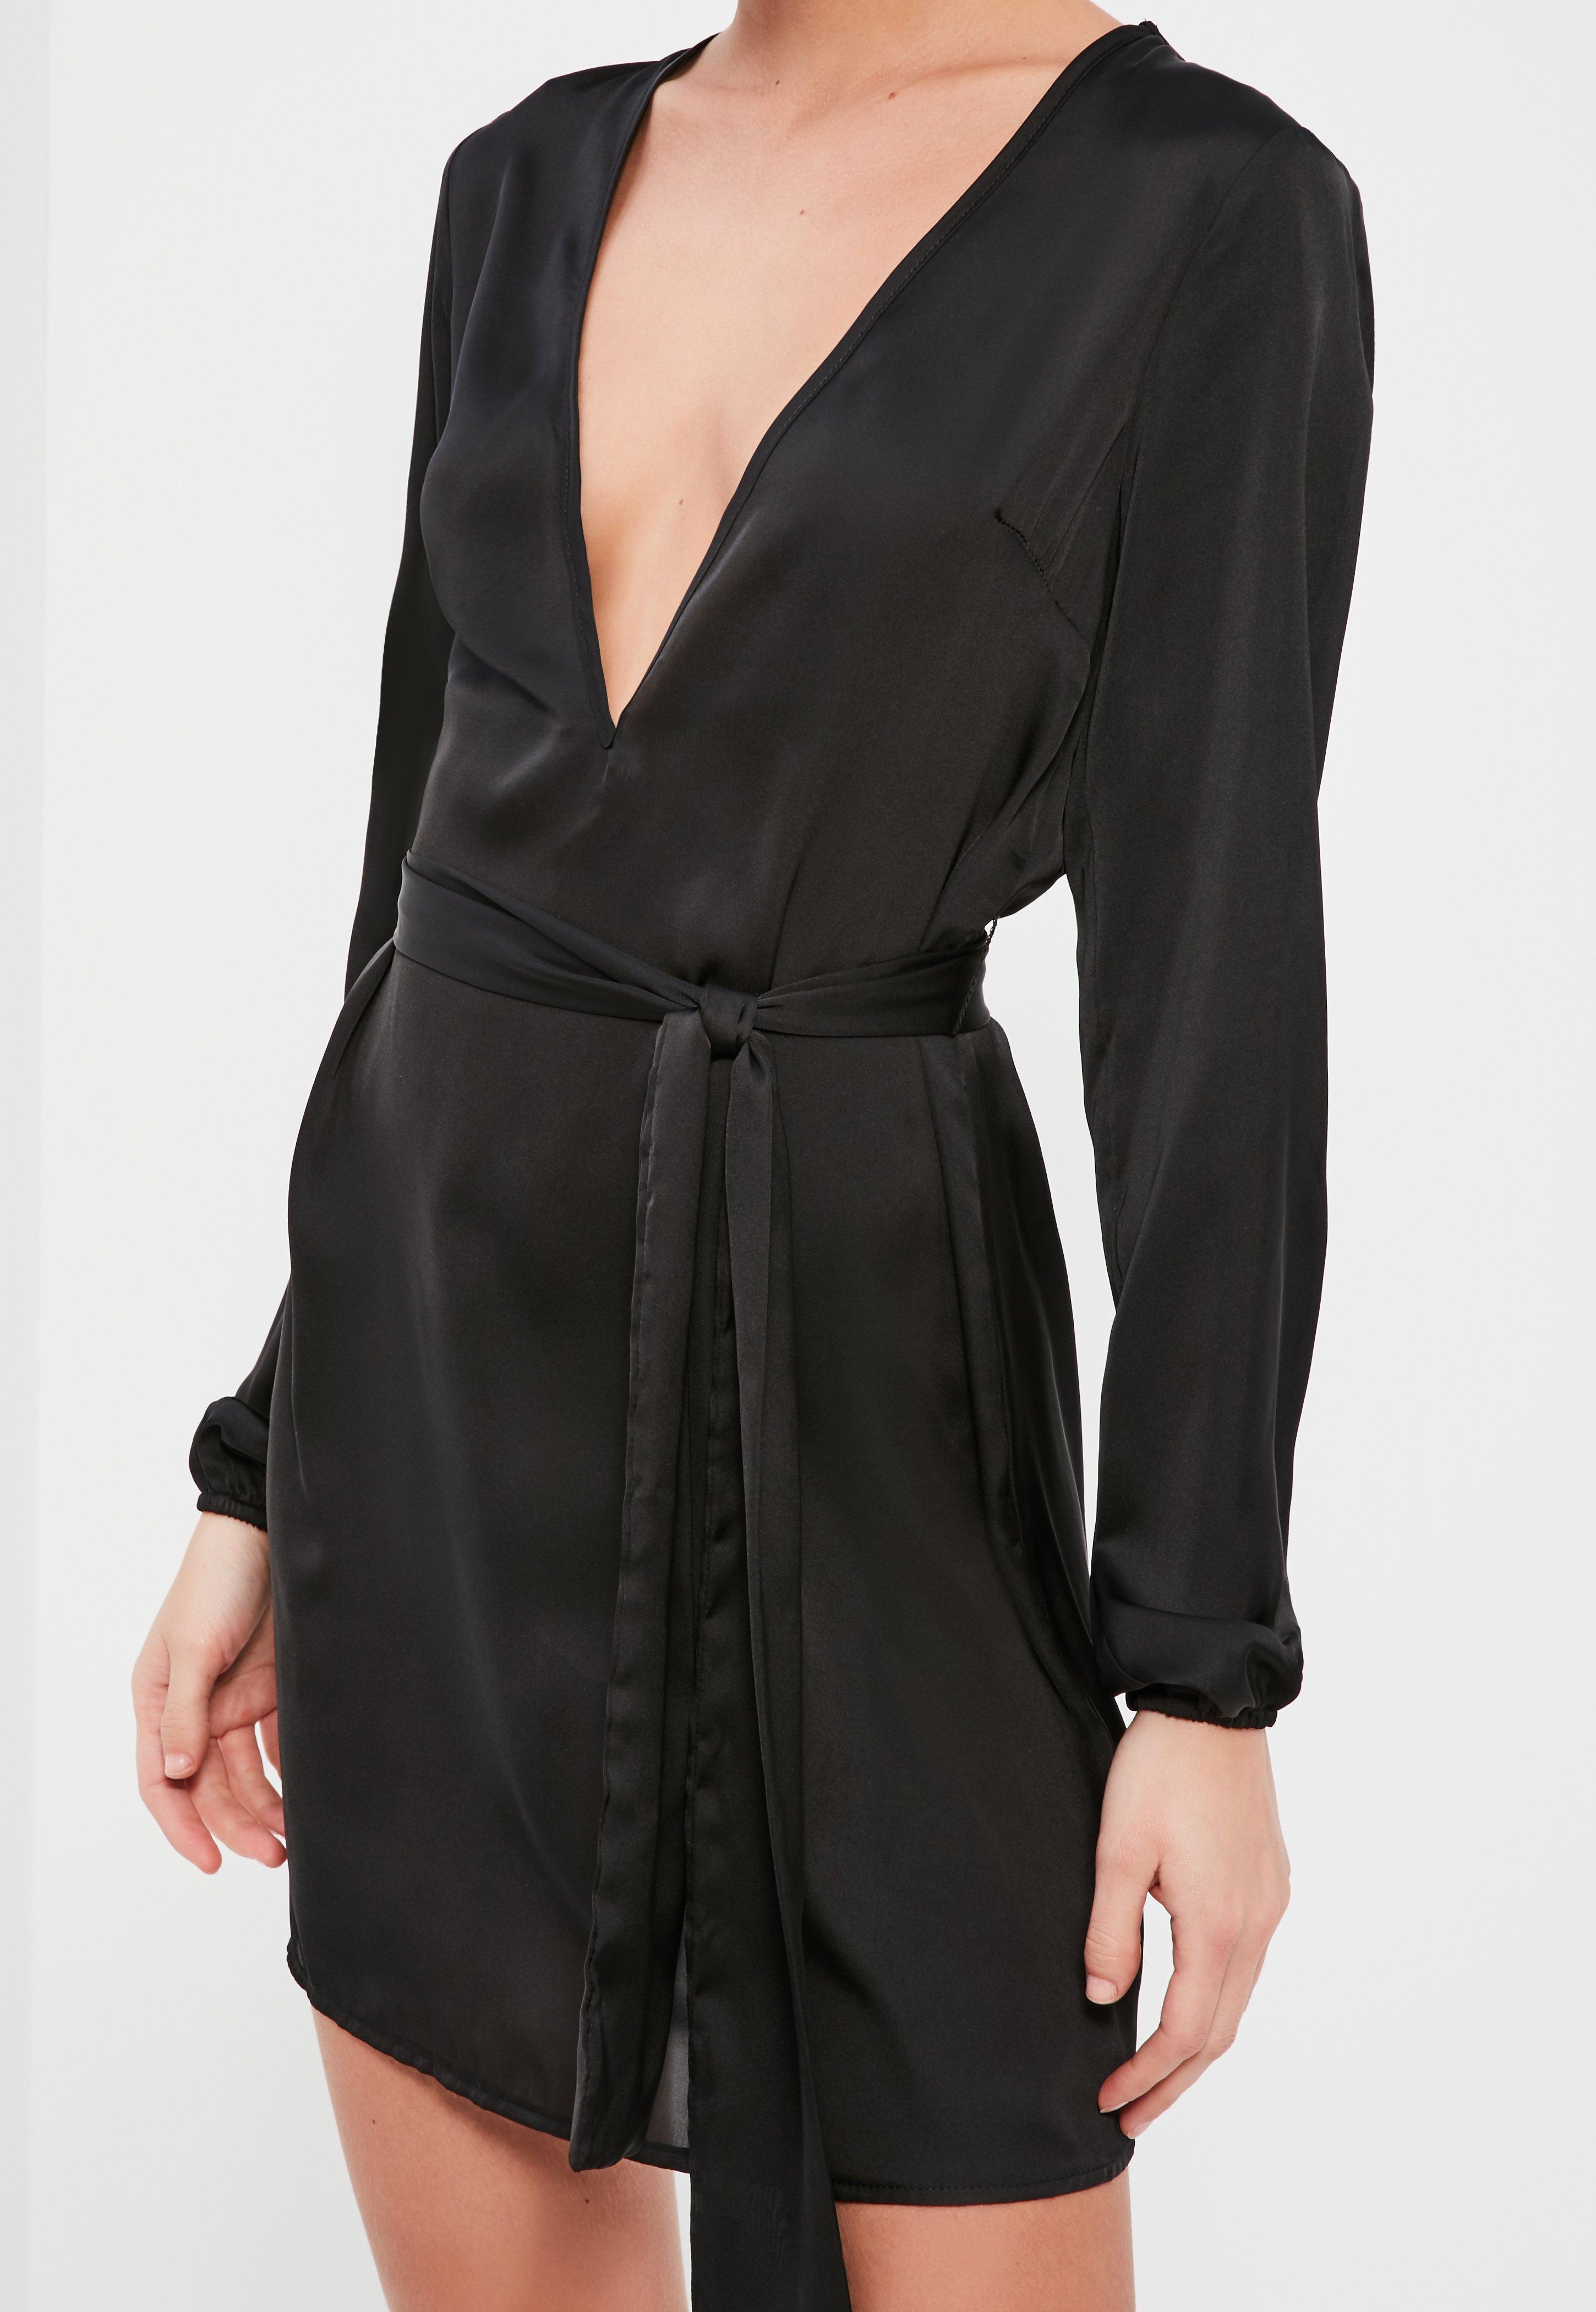 Black Silky Choker Neck Swing Dress